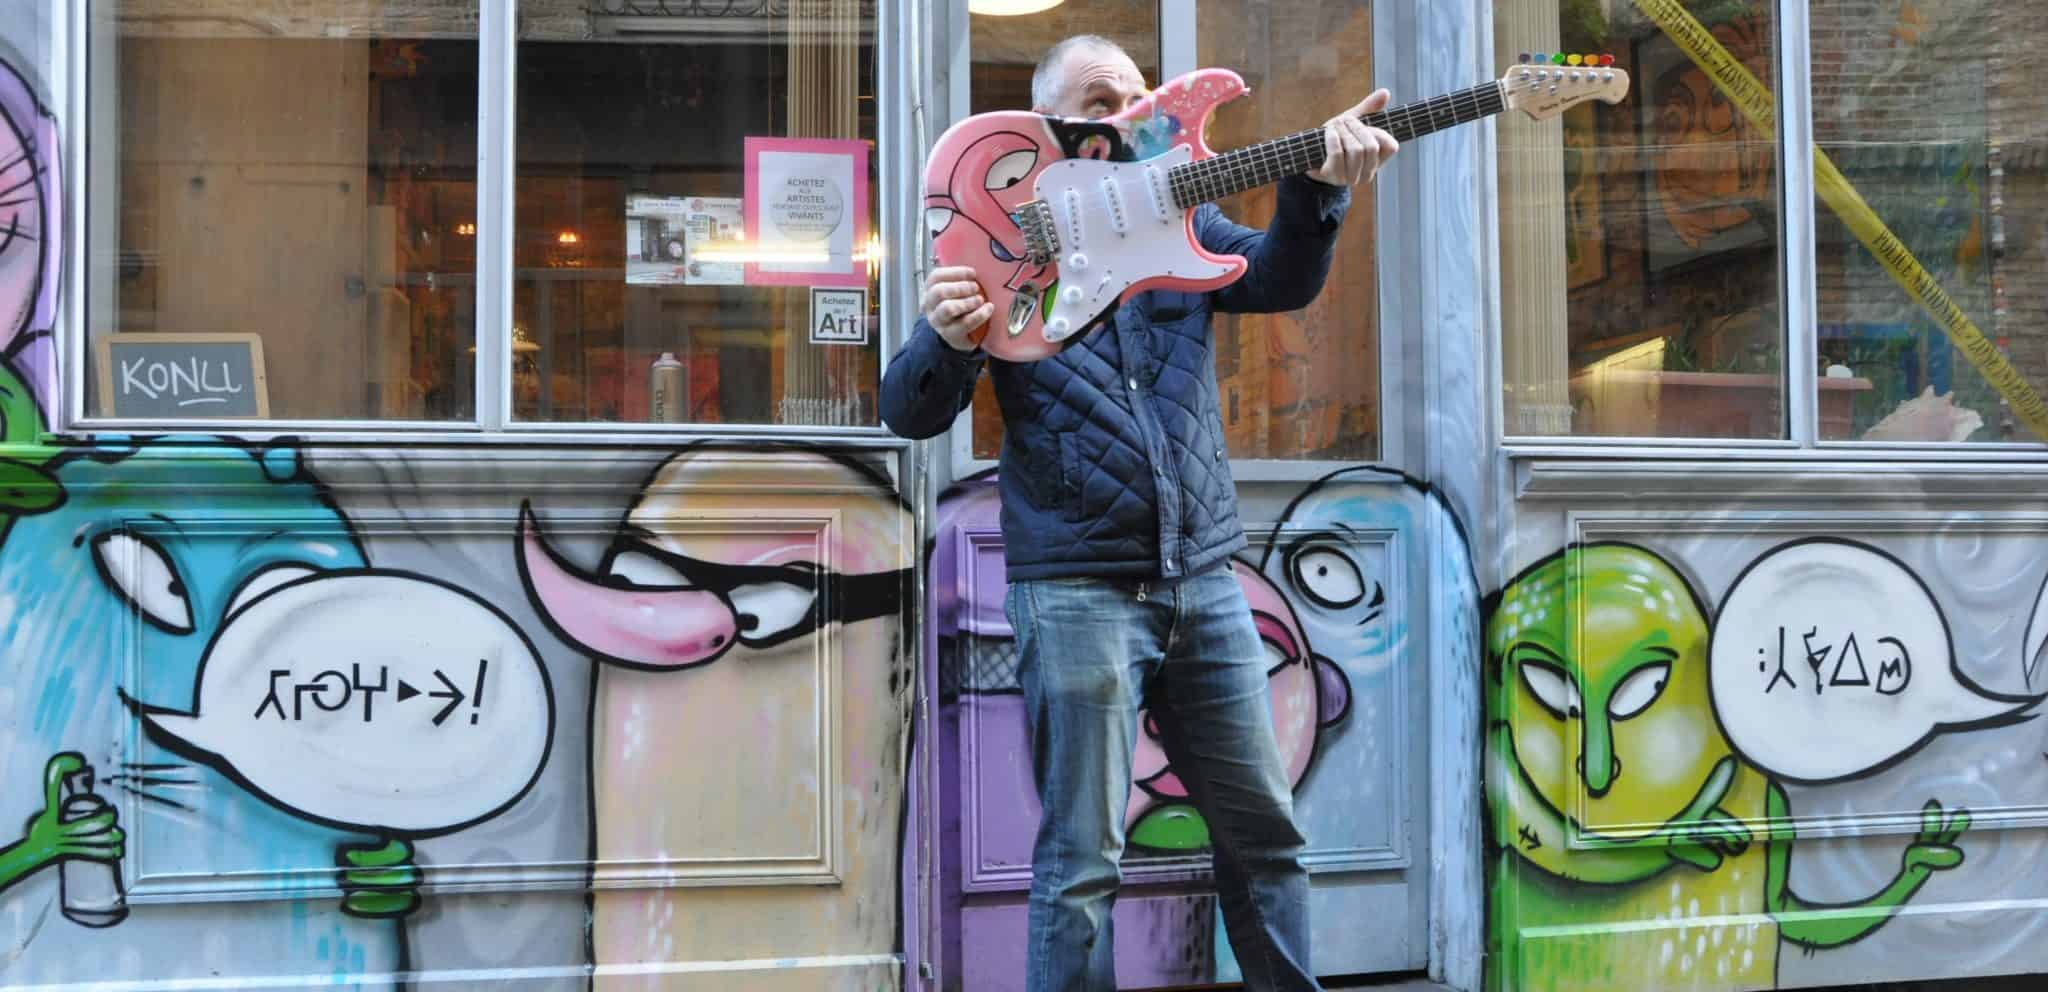 Konu customise guitare enchères Bataclan